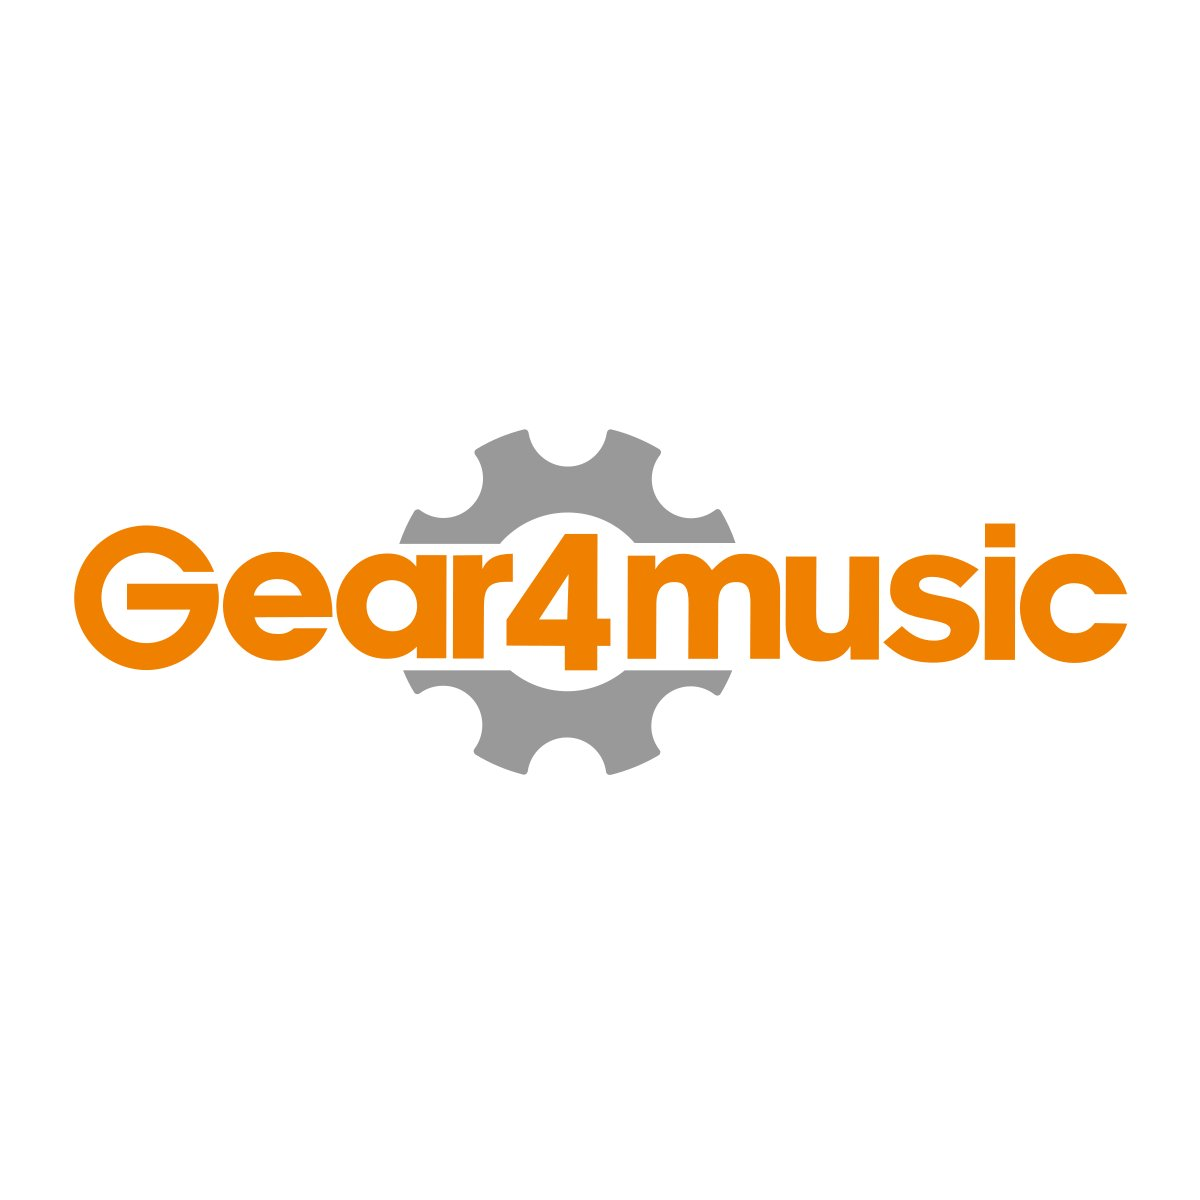 evans hybrid s black marching snare drum head 14 gear4music. Black Bedroom Furniture Sets. Home Design Ideas